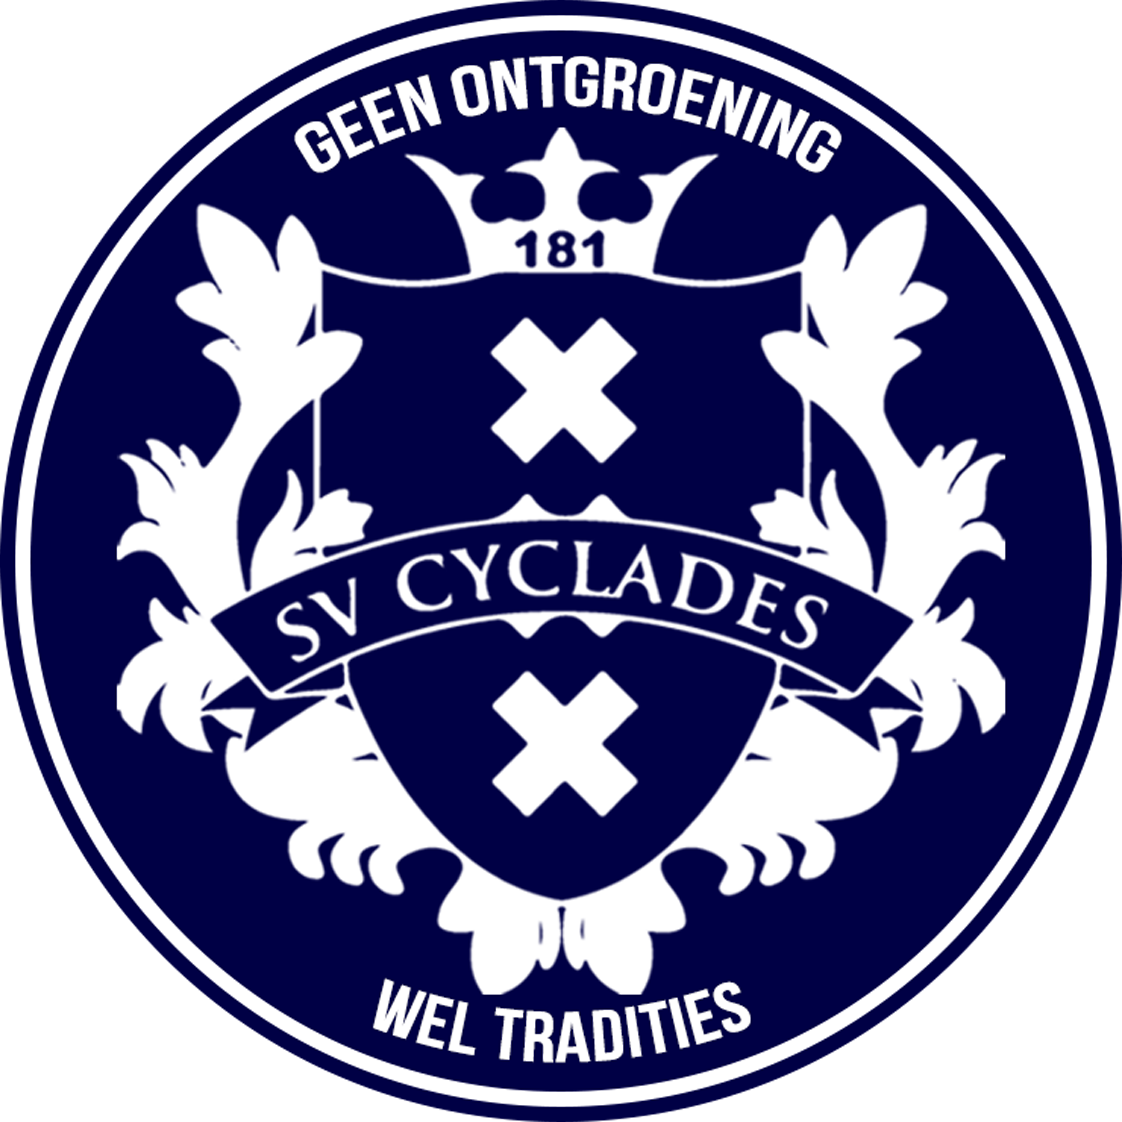 S.V. Cyclades